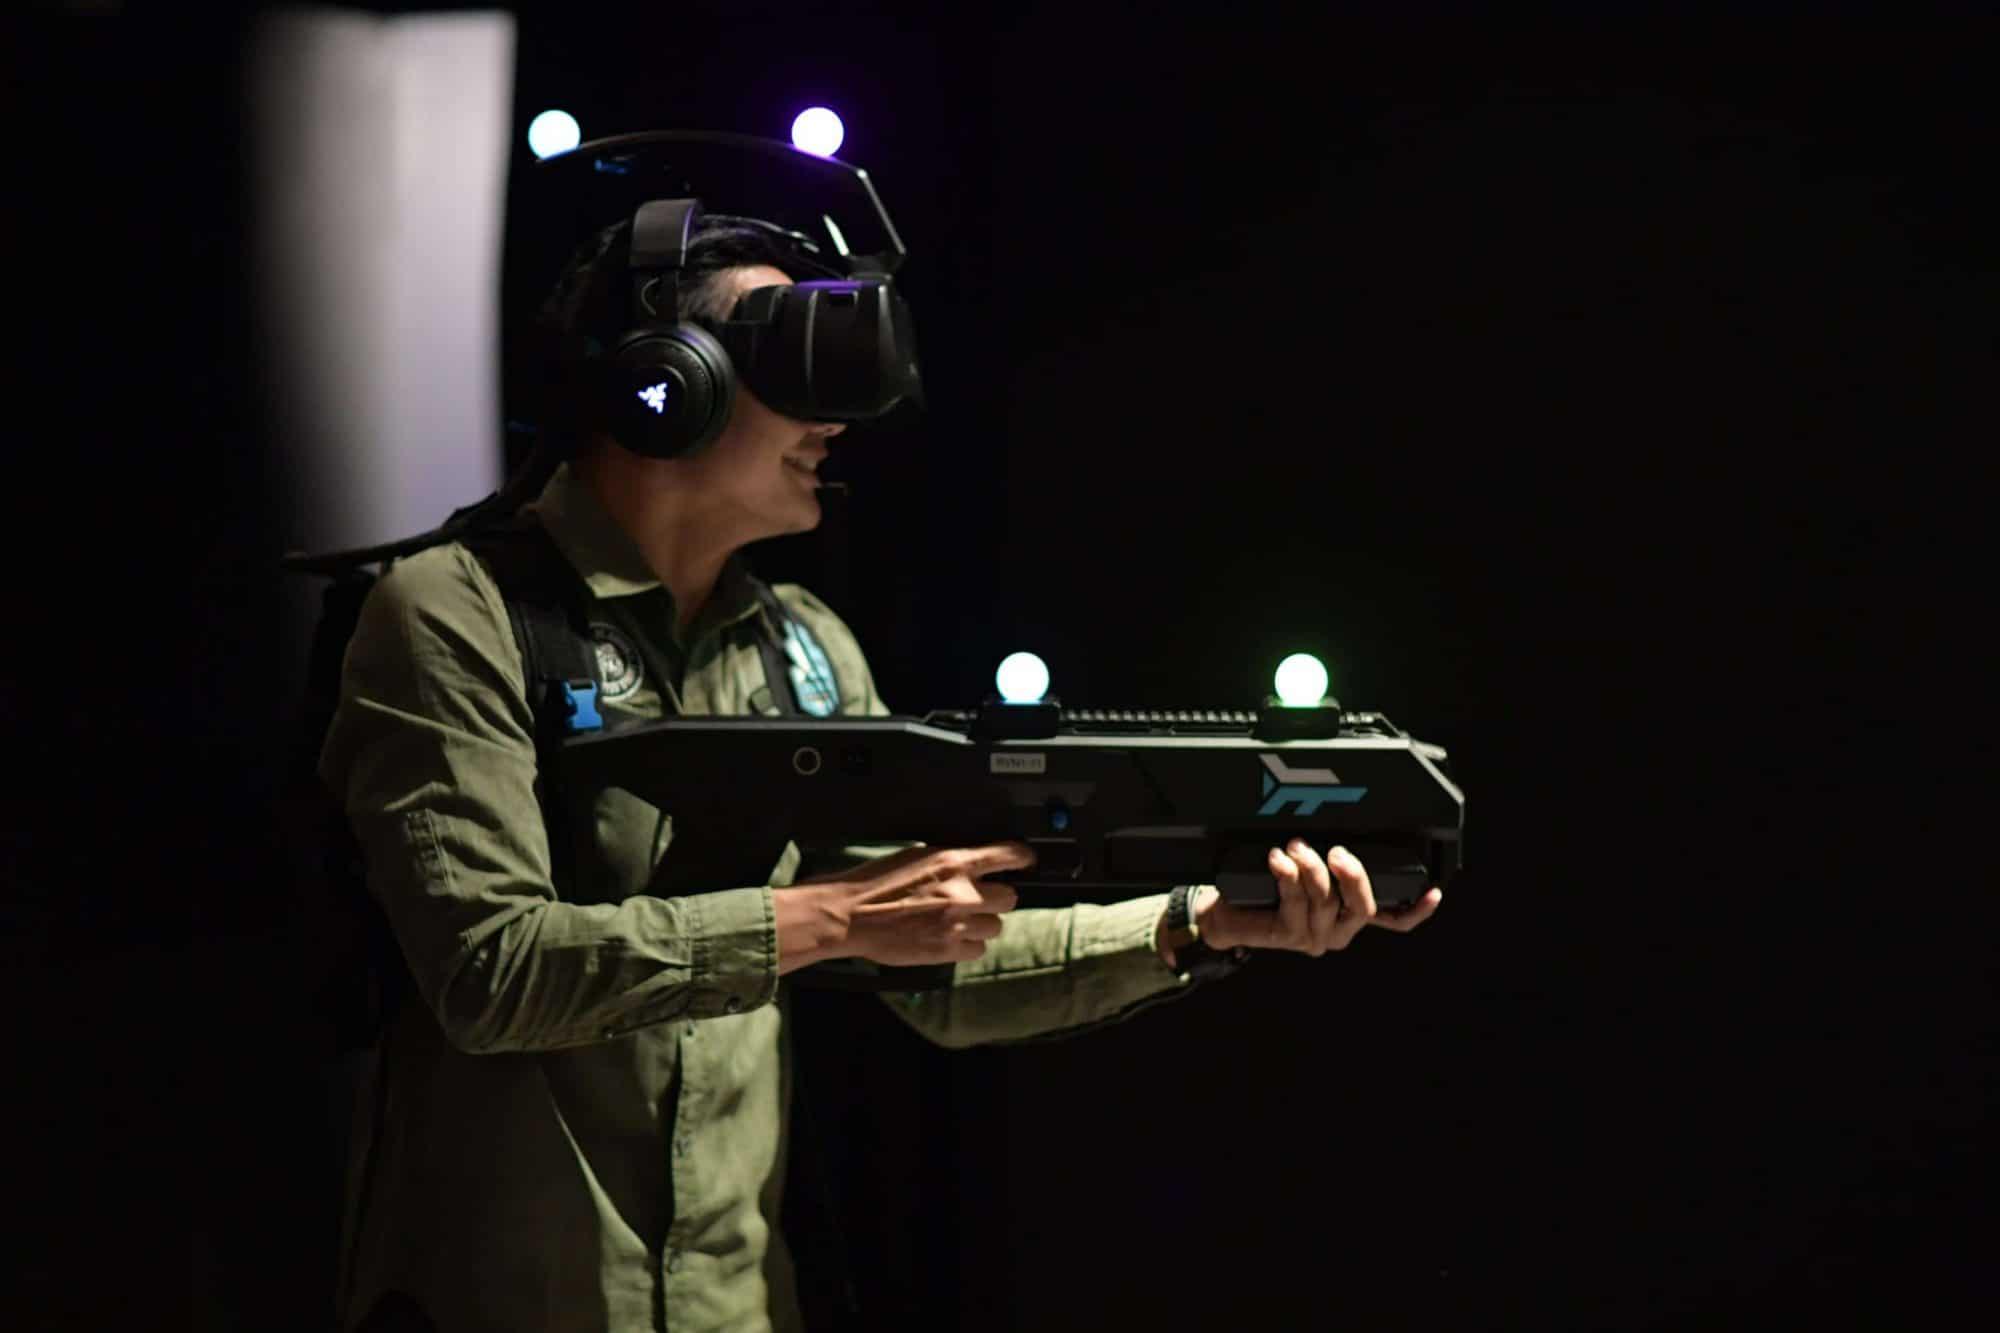 ZERO LATENCY สนามแข่งขันเกม VR ในระบบไร้สาย เปิดตัวในไทยแล้ว ณ โรงแรมโนโวเทล สยามสแควร์ 4